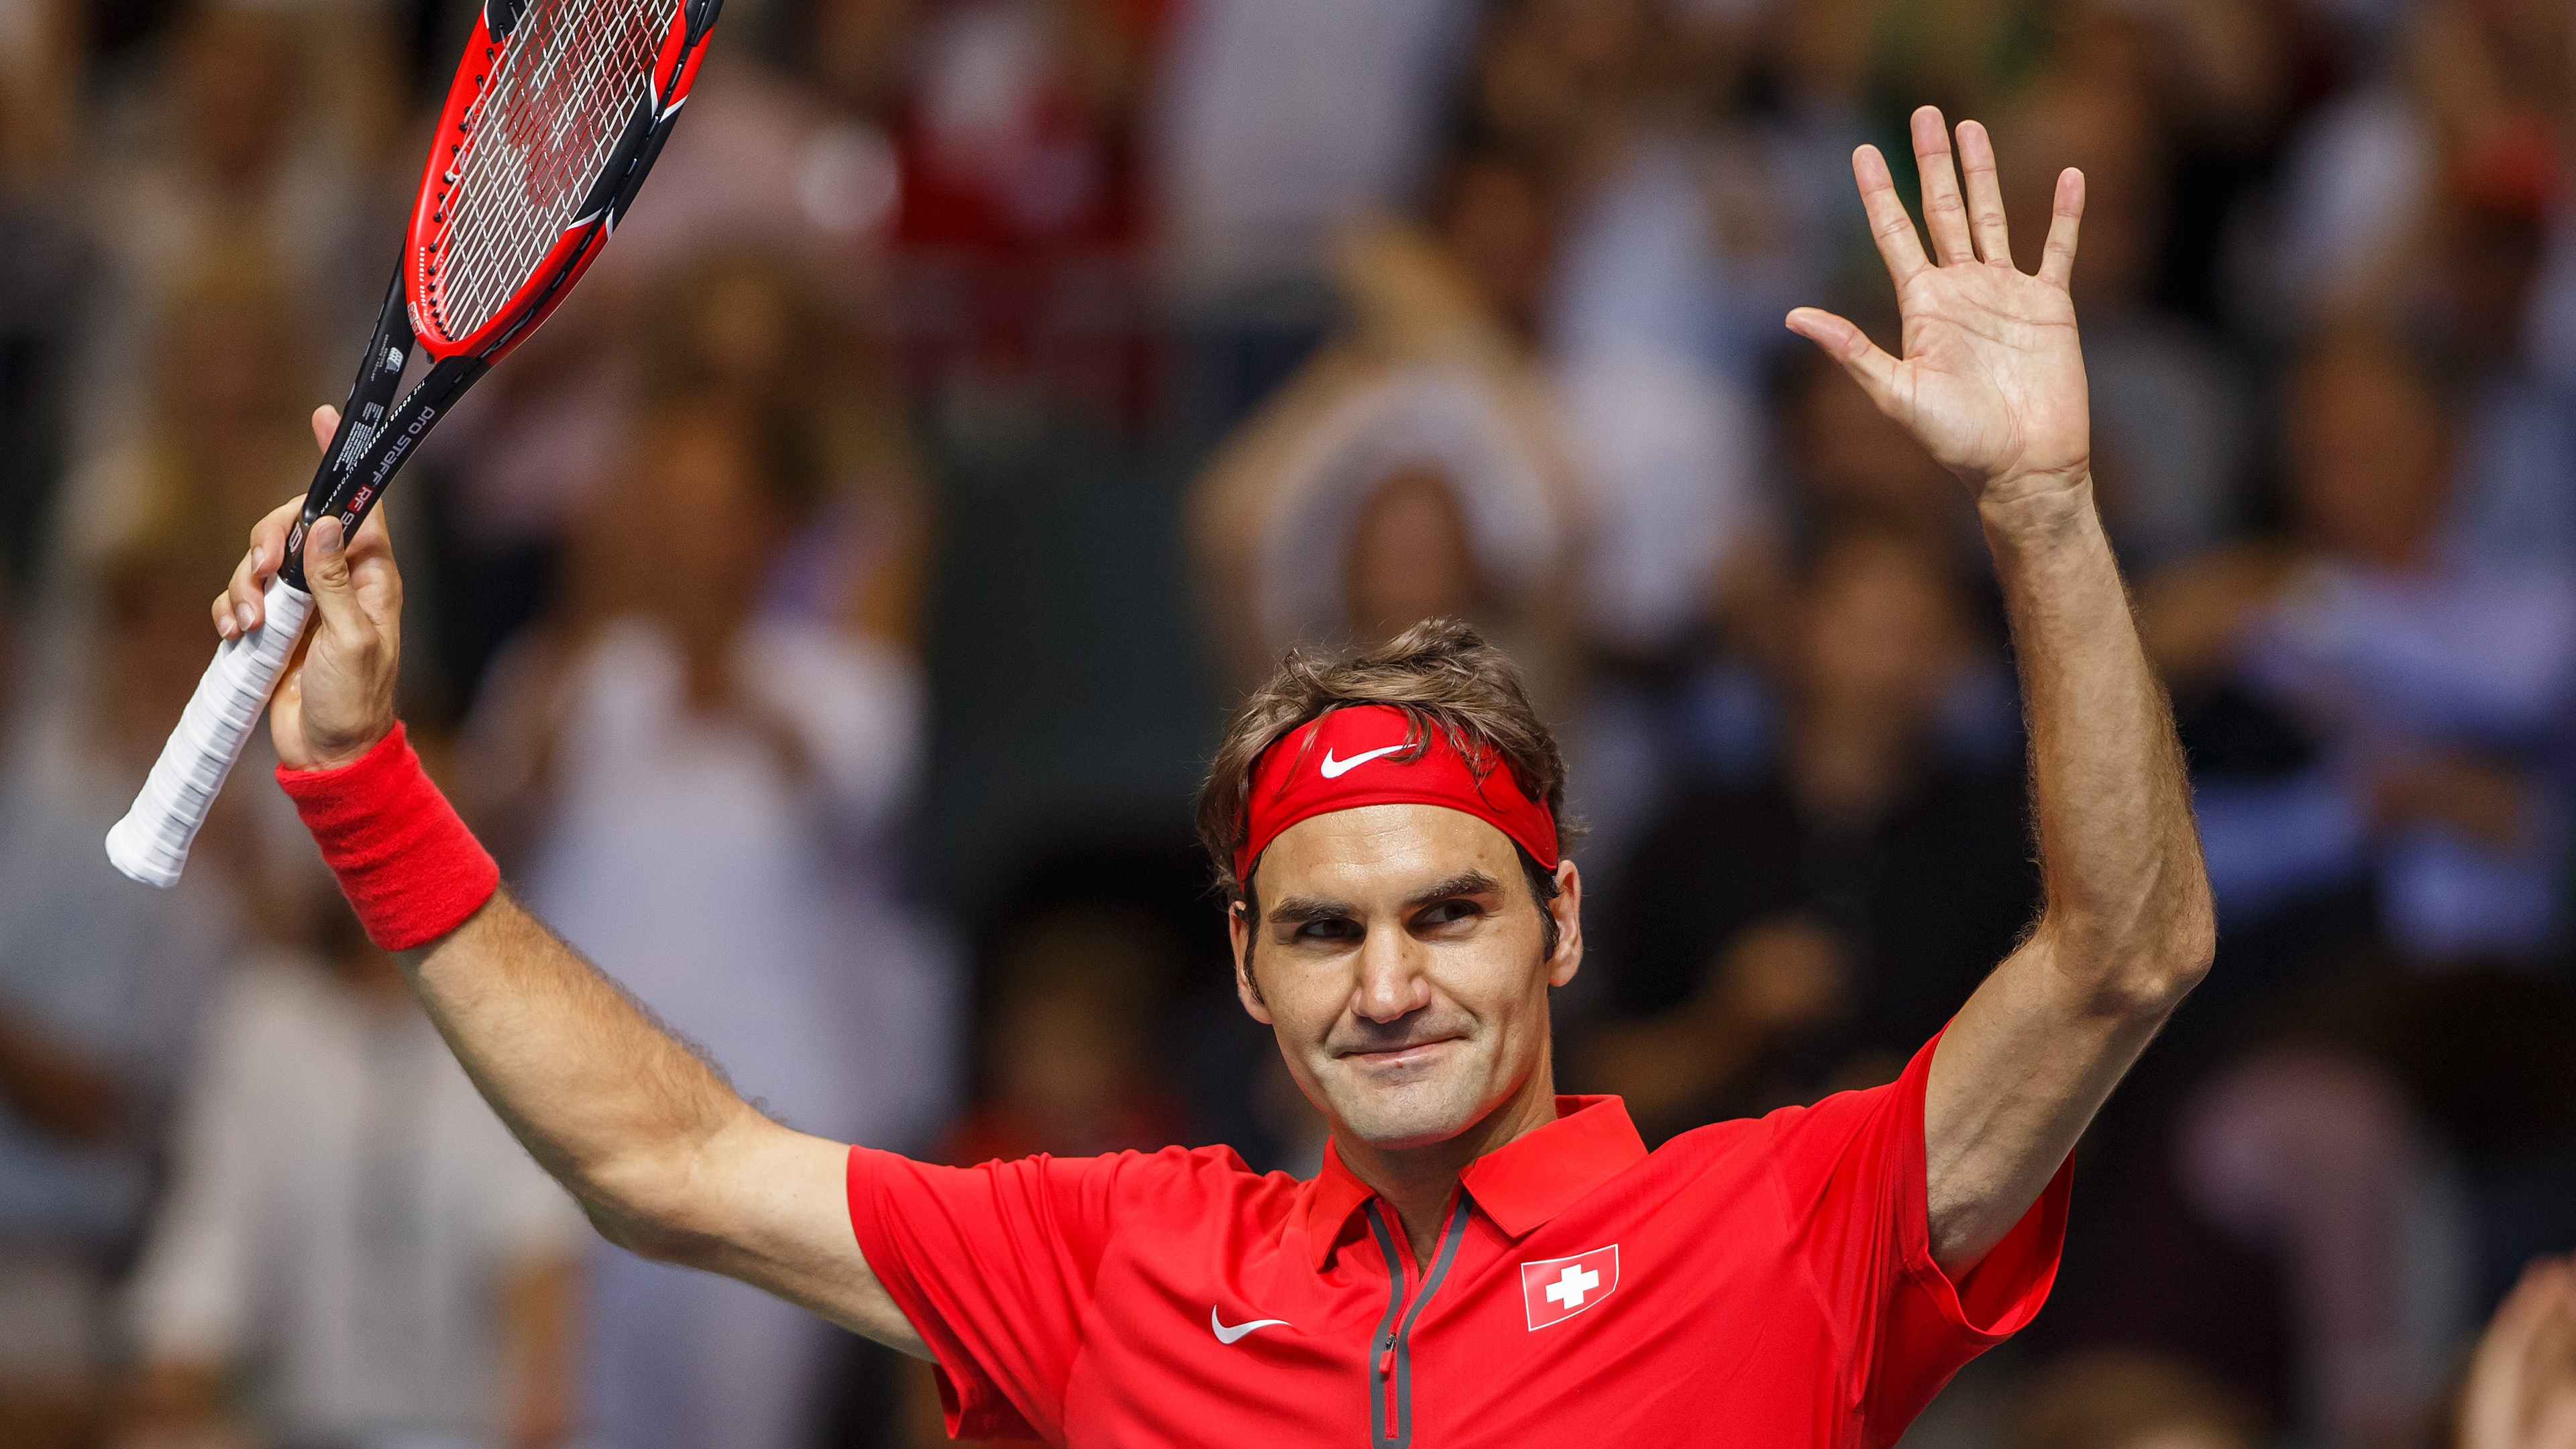 Wallpaper 4k Roger Federer Tennis Player Federer Lebron Player Roger Tennis